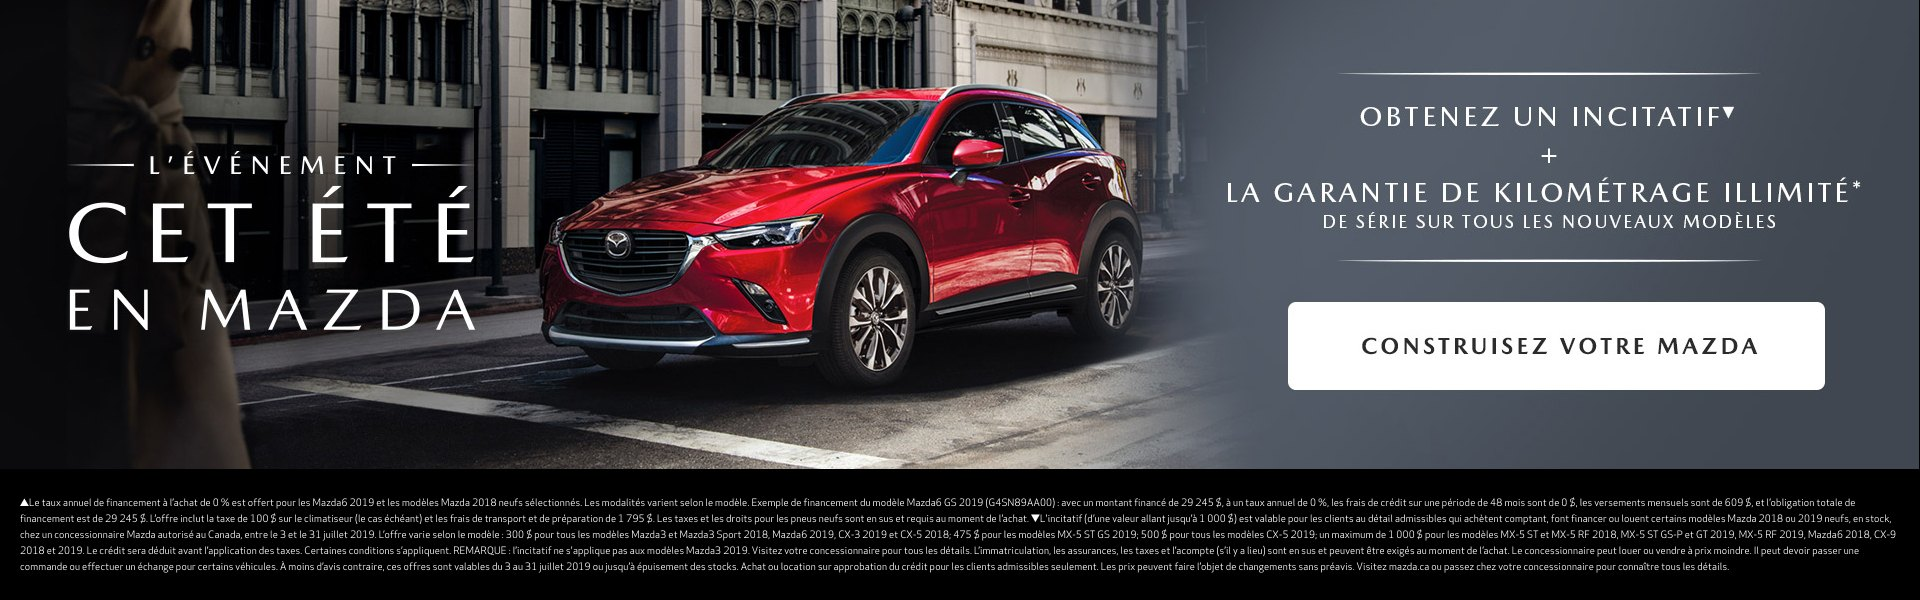 Événement Mazda Summer Drive